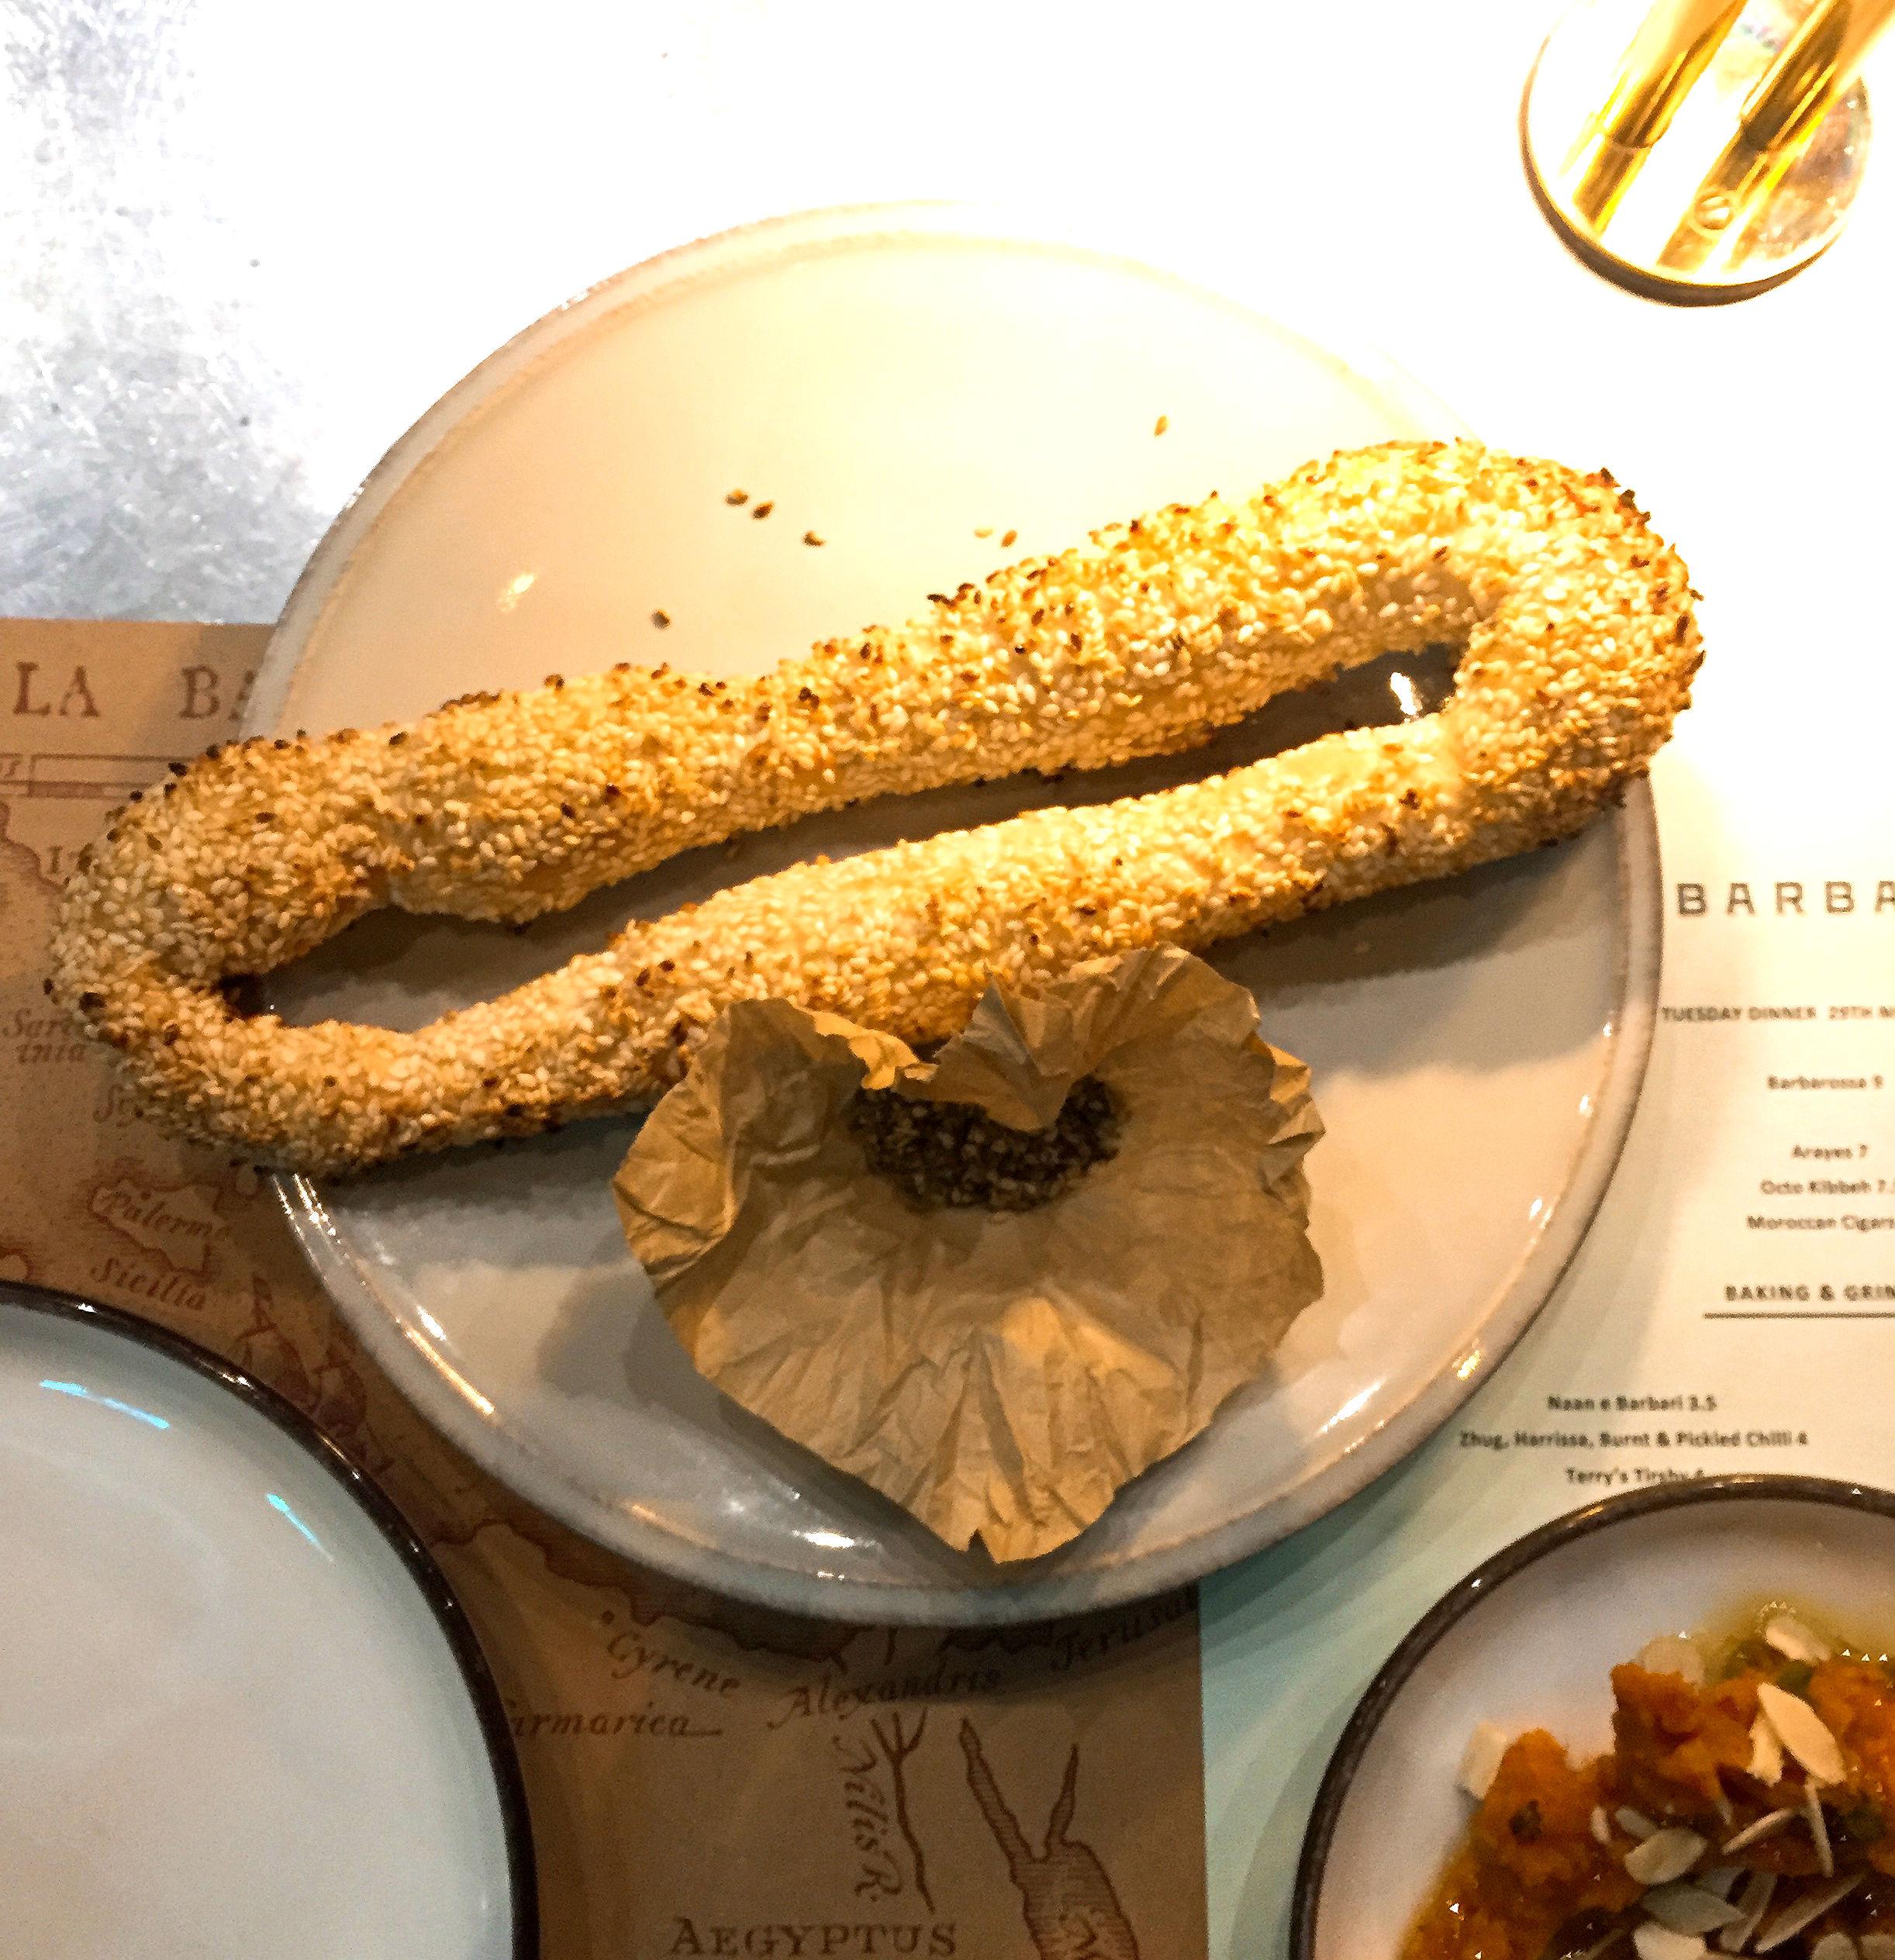 Jerusalum Bagel at The Barbary Restaurant